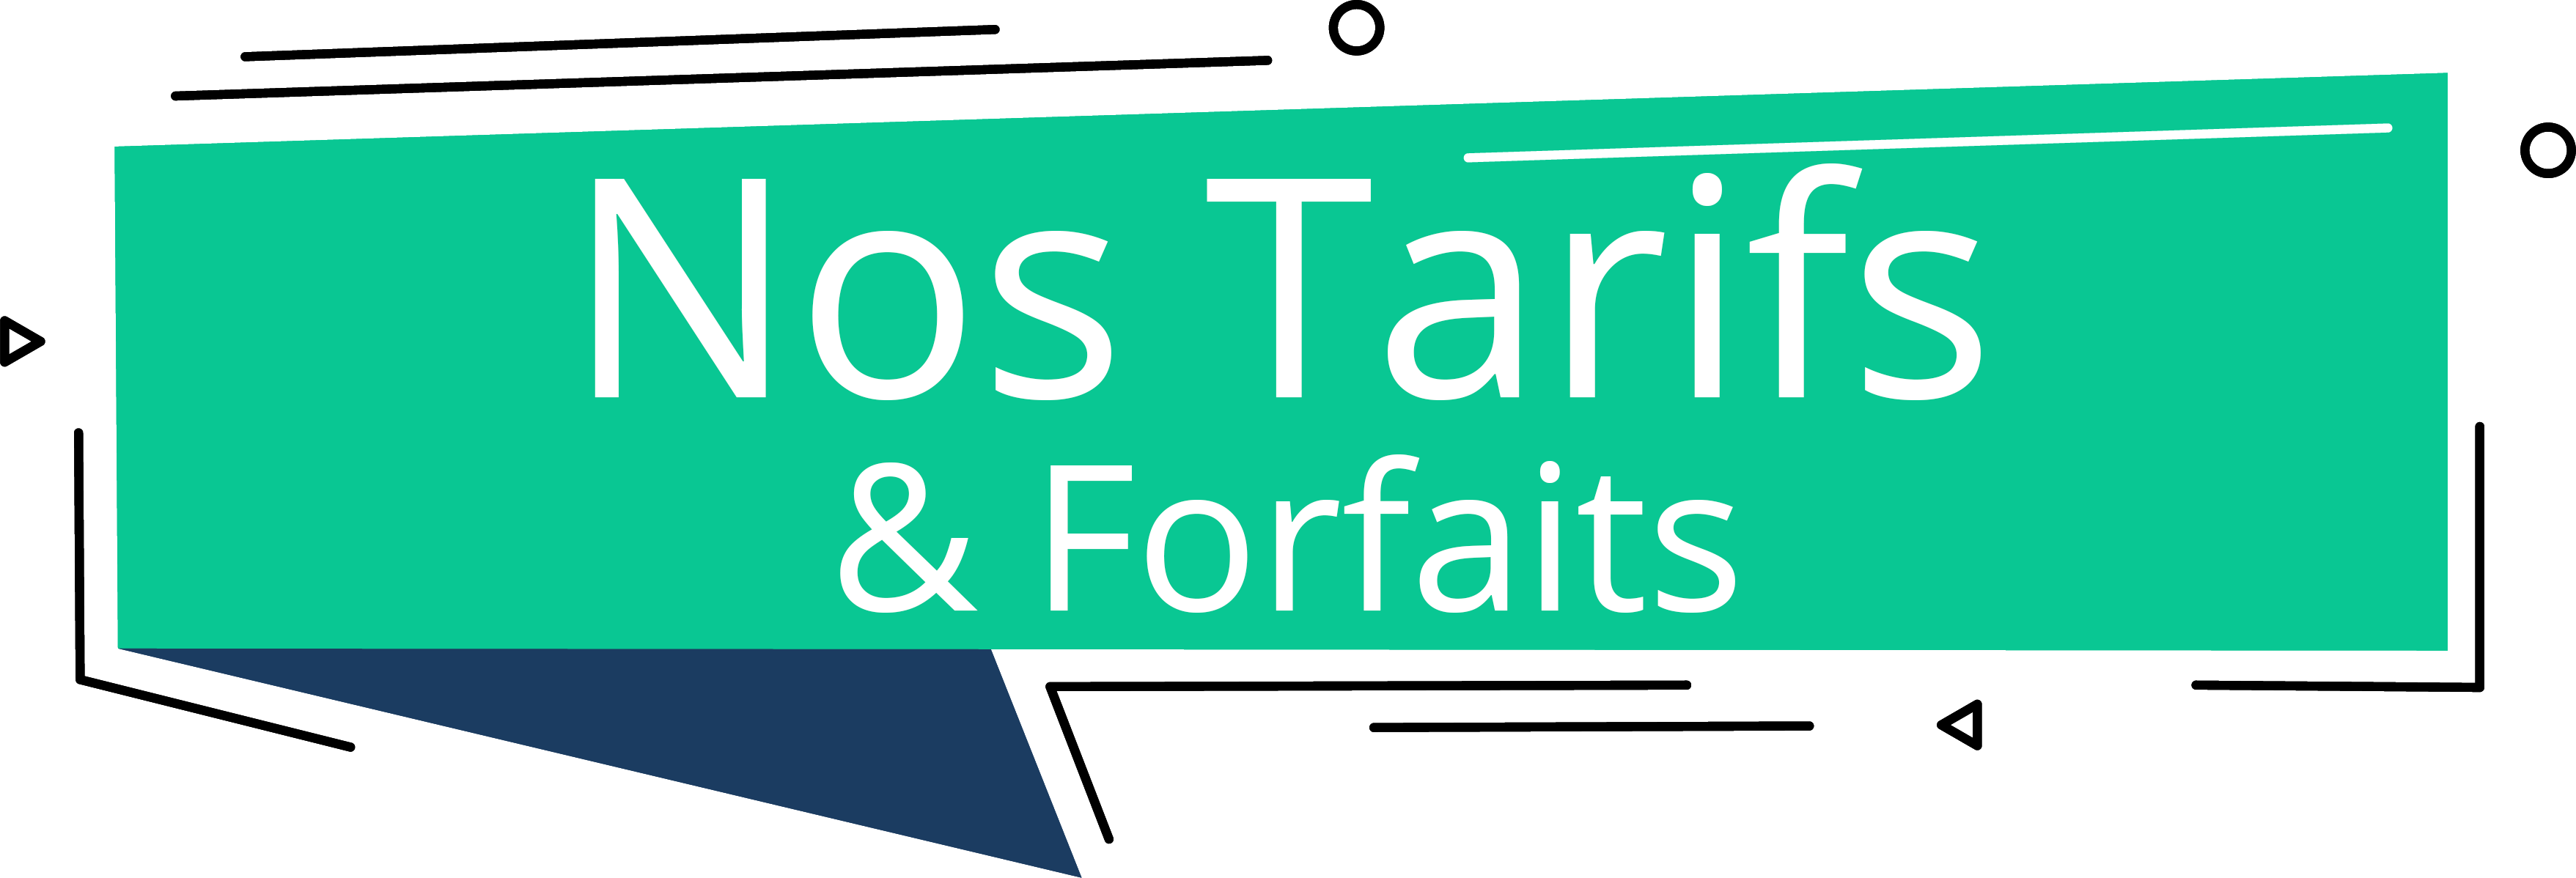 tarifs-et-forfaits